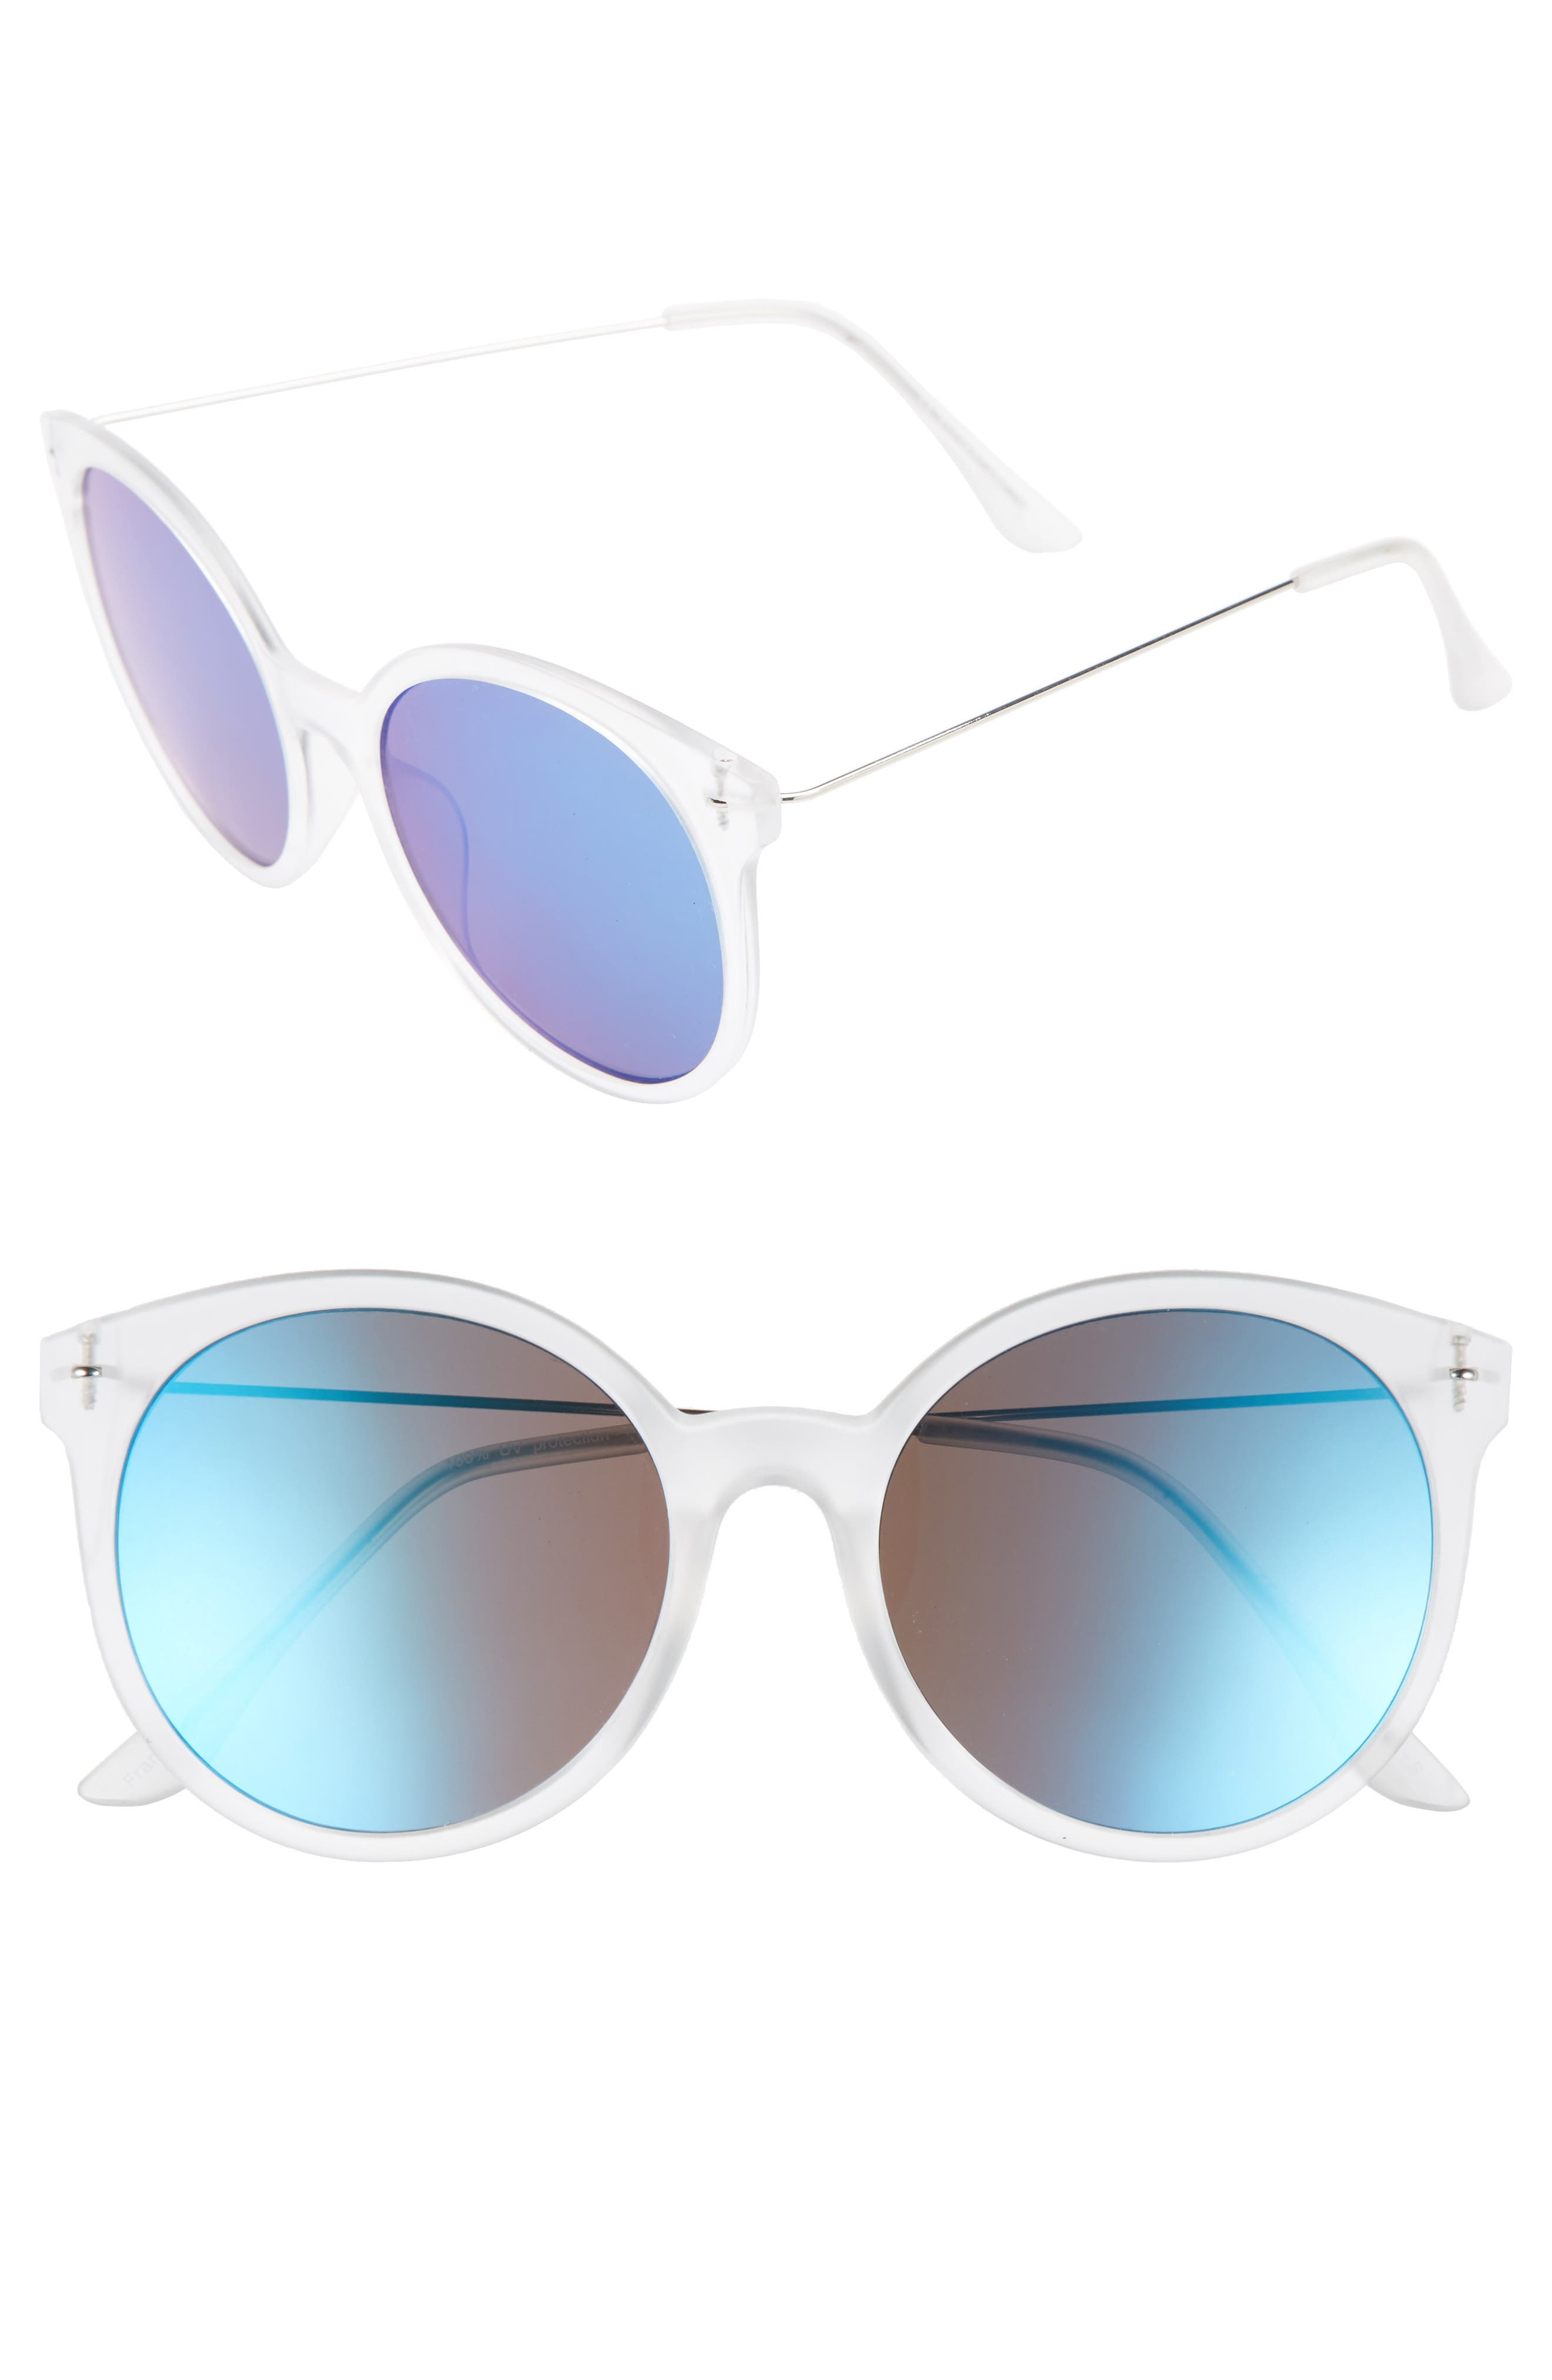 GLANCE EYEWEAR 62mm Transparent Round Lens Sunglasses, Main, color, 100